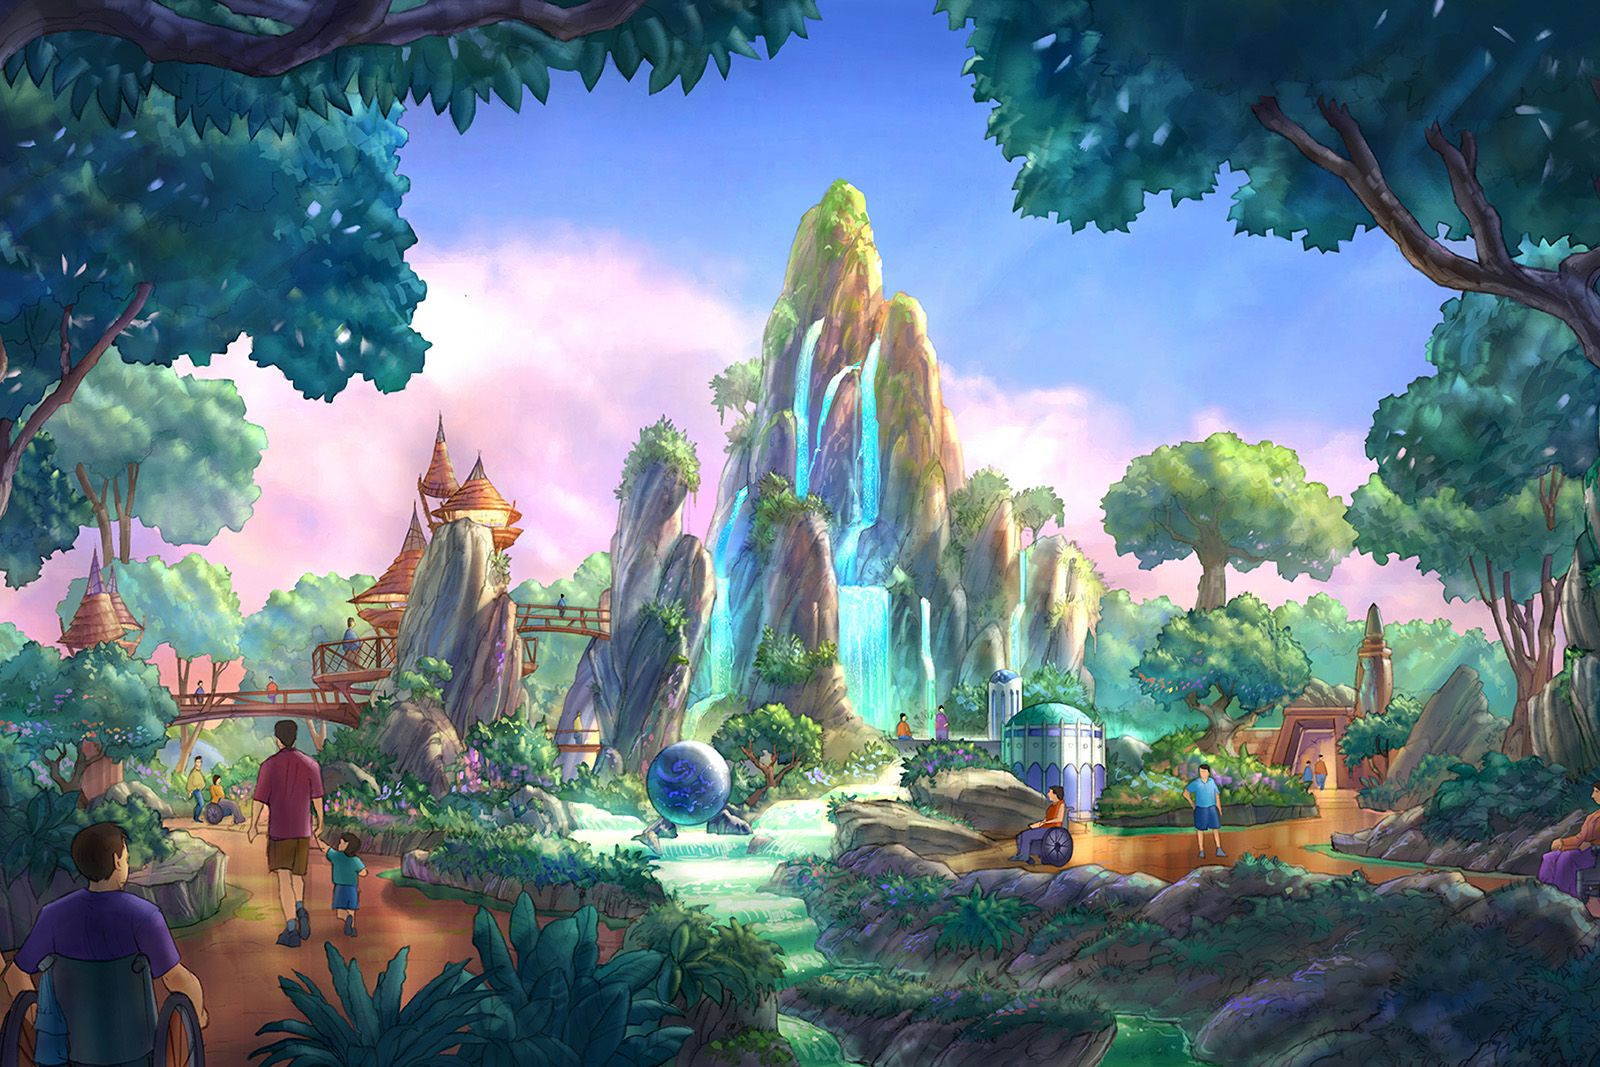 Wushia Disney Concept Art Theme Park Planning Disney Theme Parks